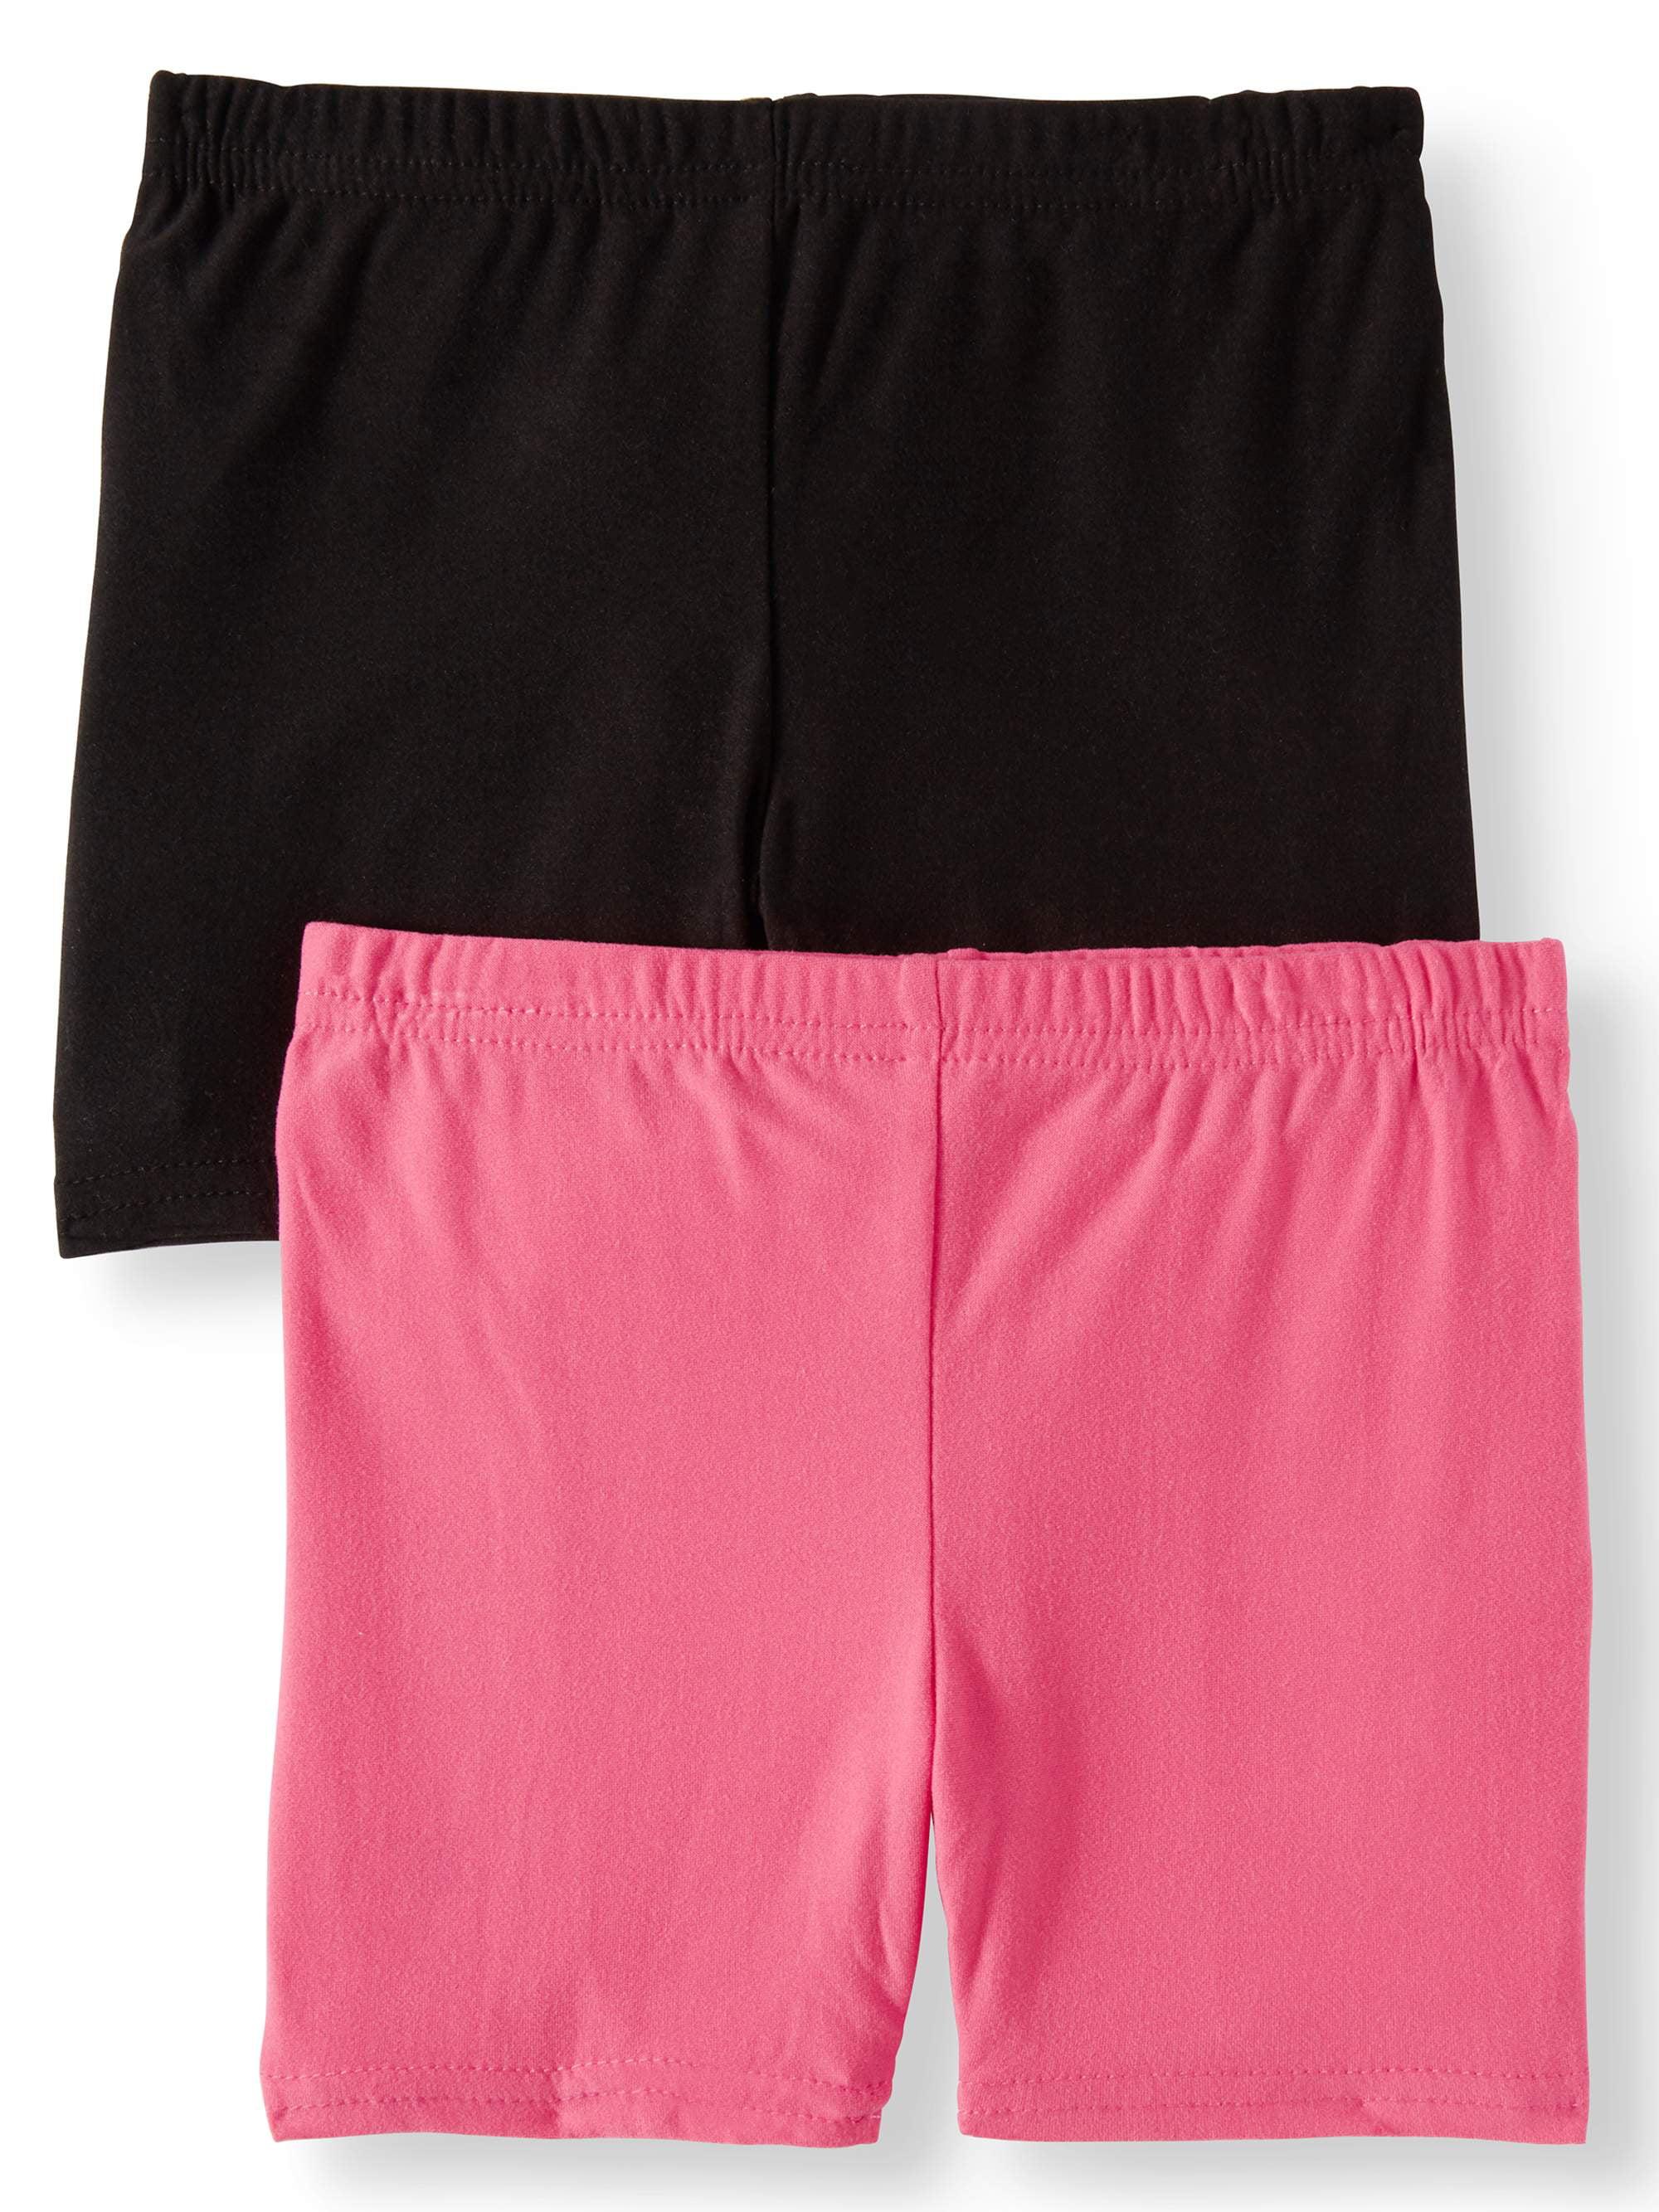 aebda8cb ONE STEP UP - Solid Bike Shorts, 2-Pack (Little Girls & Big Girls) -  Walmart.com